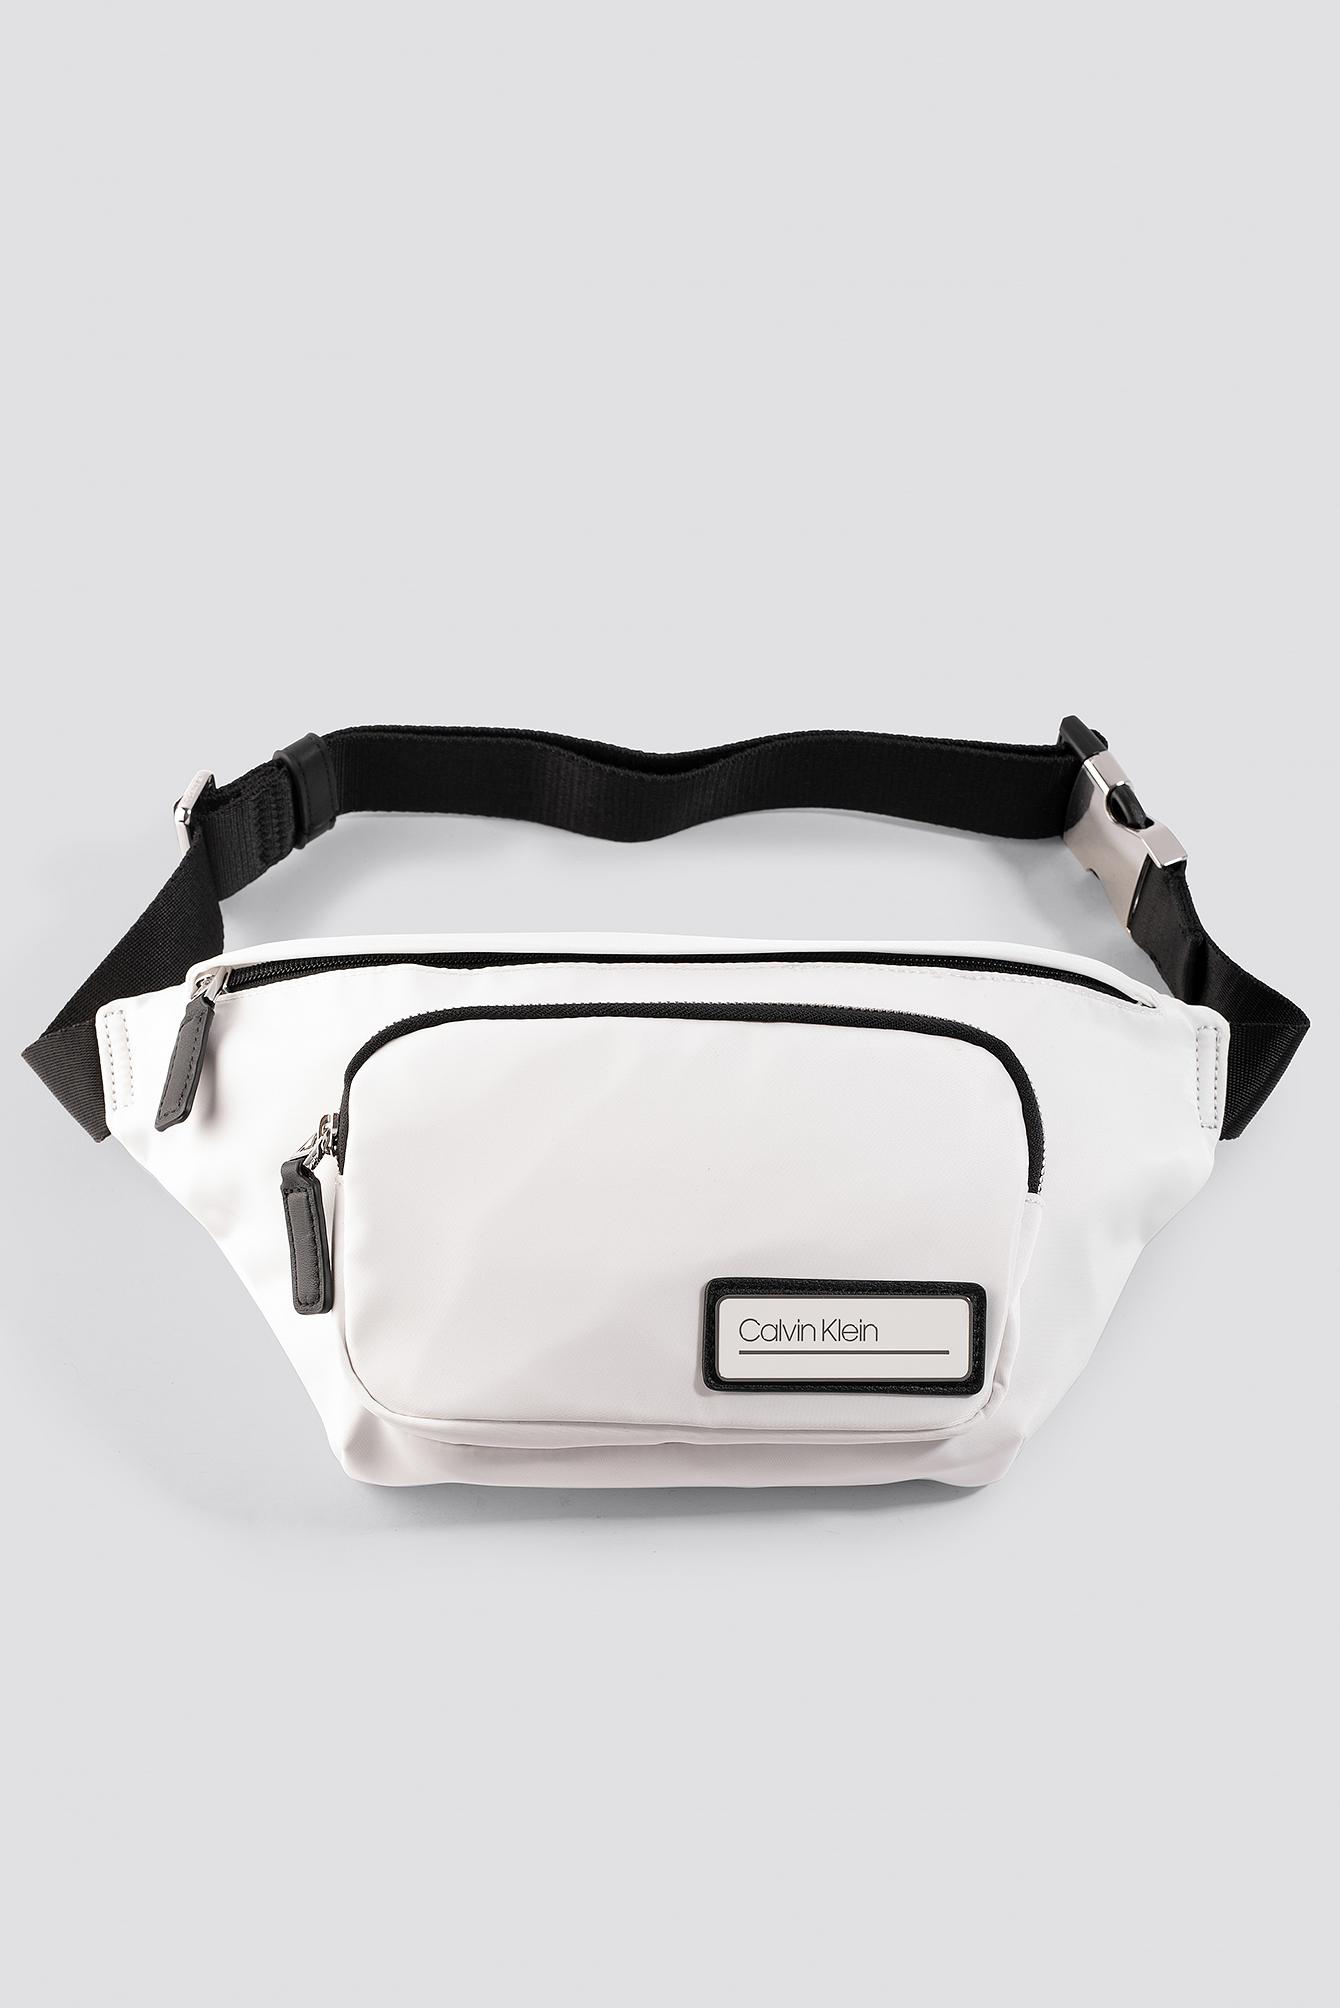 Calvin Klein Primary Waist Bag - White In Bright White